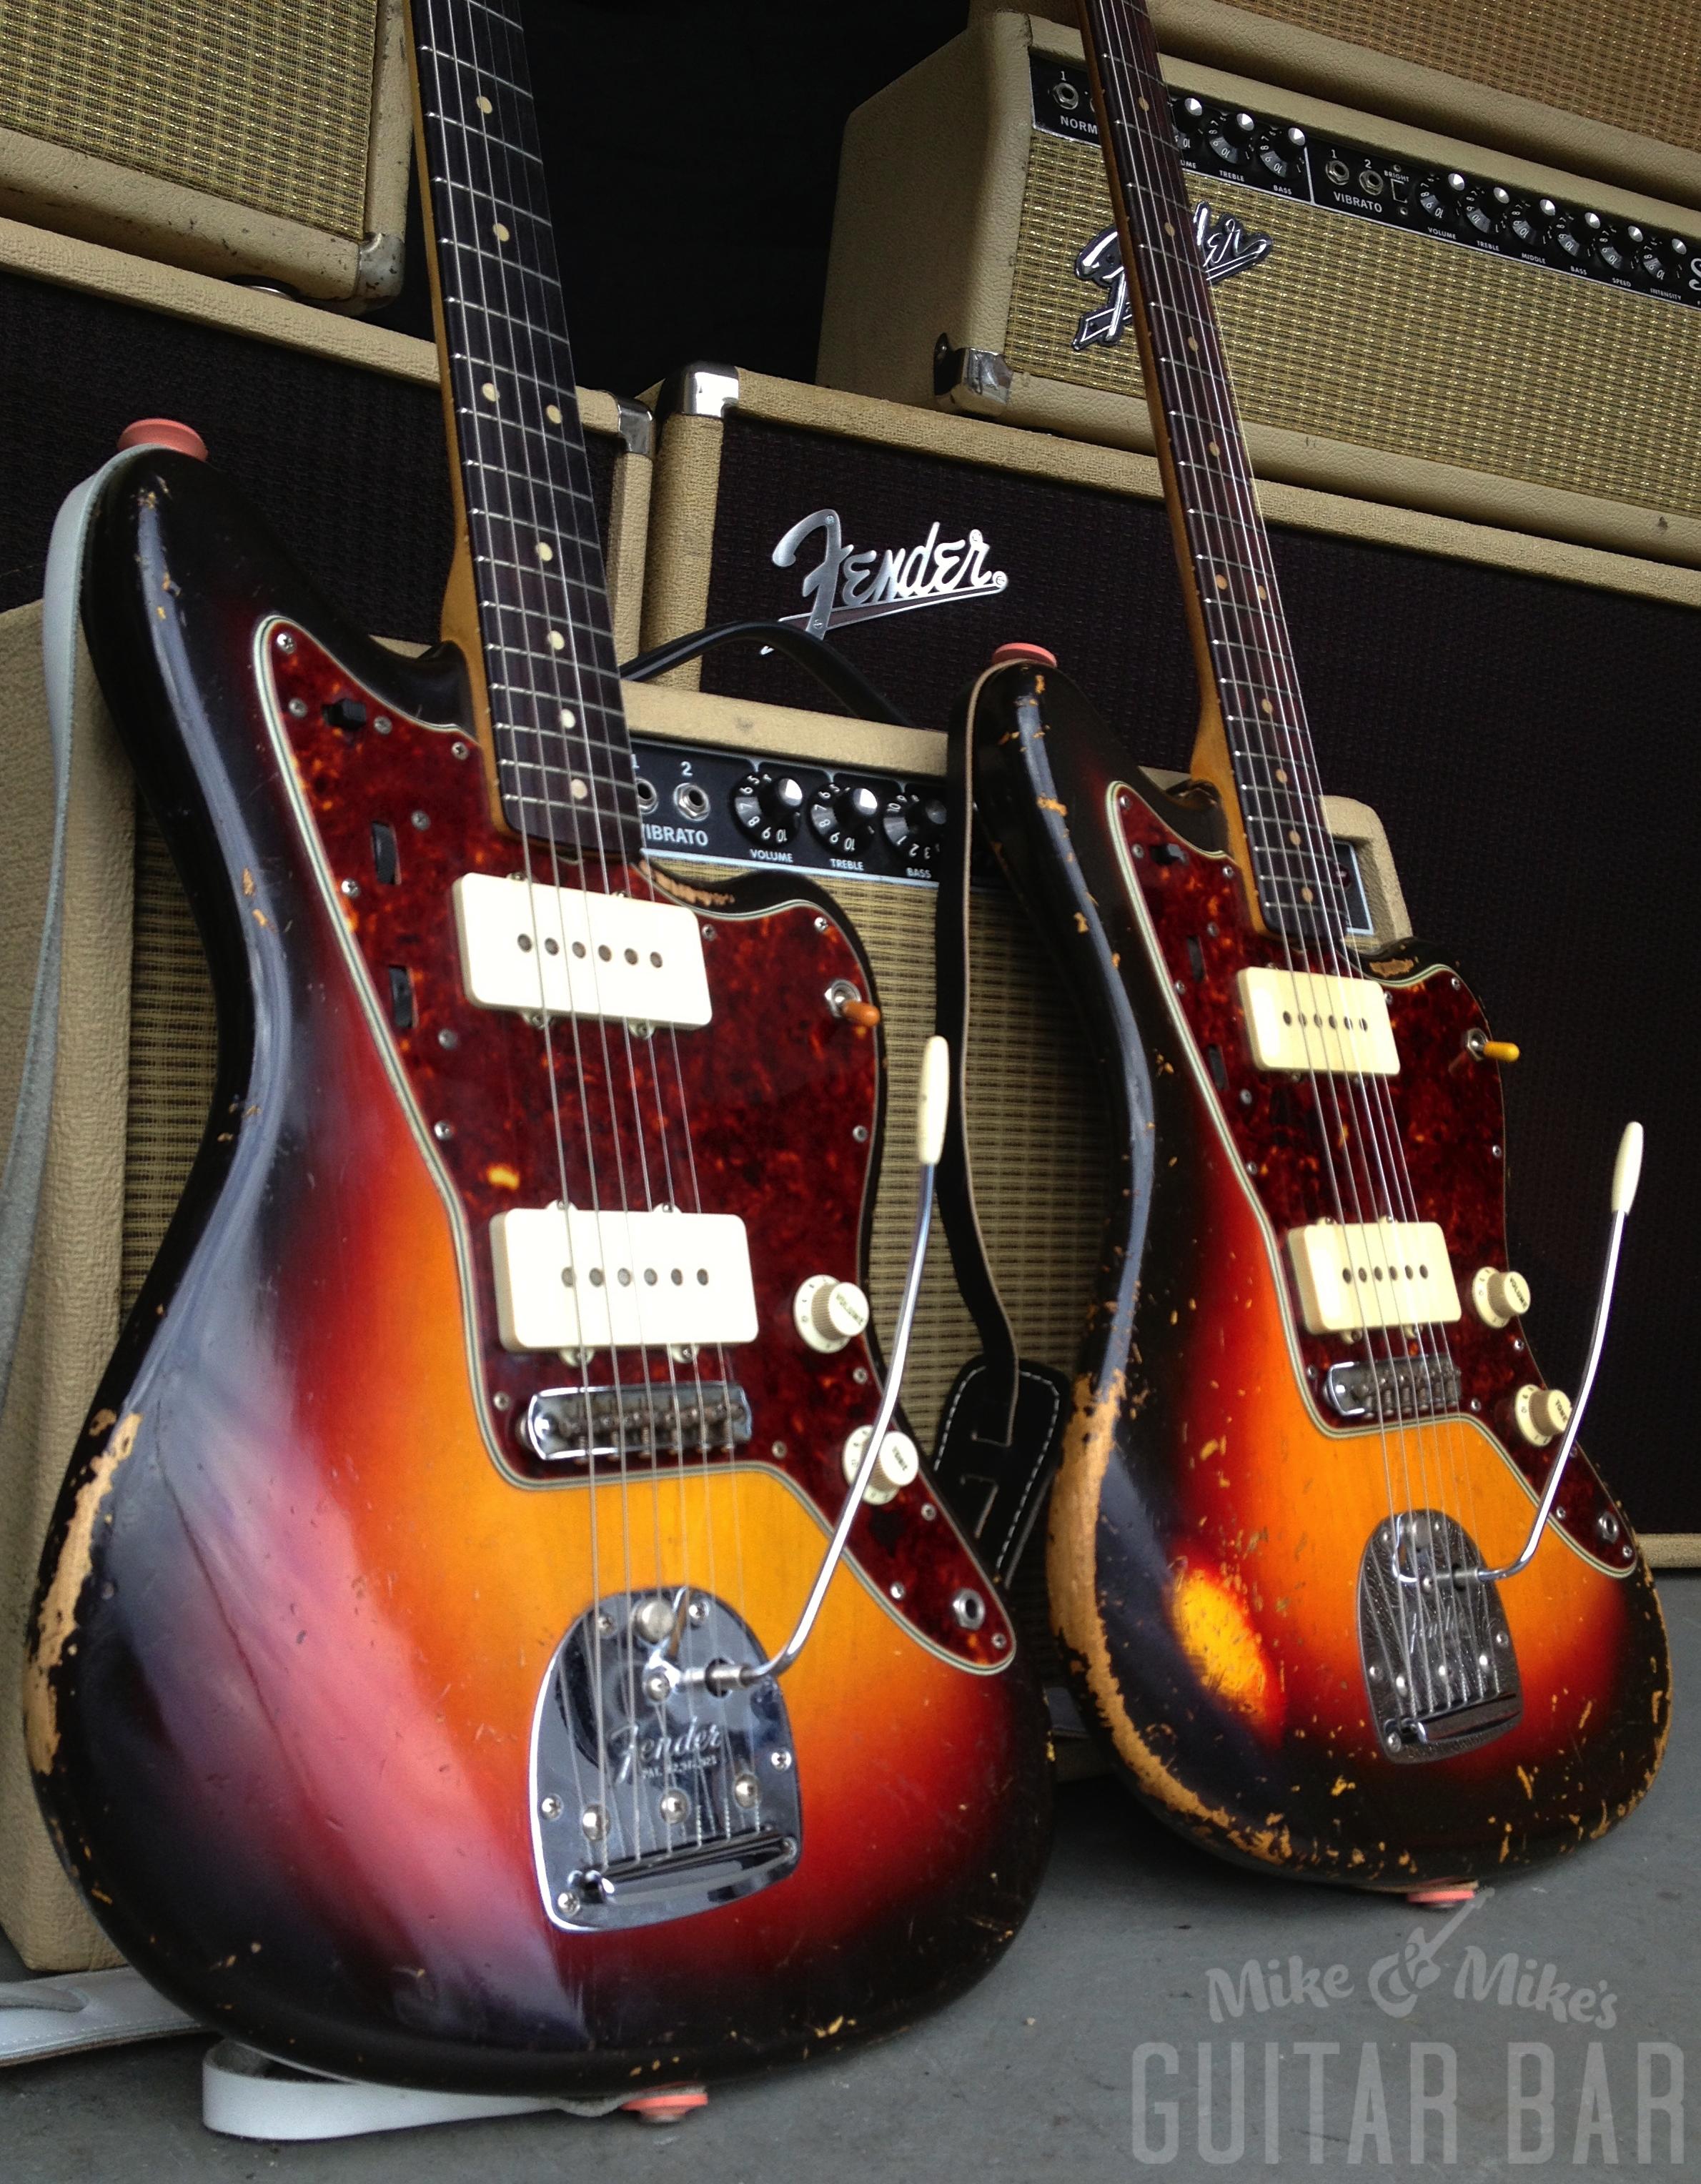 Wiring Diagram For Fender Jaguar Guitar Expert Schematics Special Tele Pickup 1963 Schematic Diagrams 1965